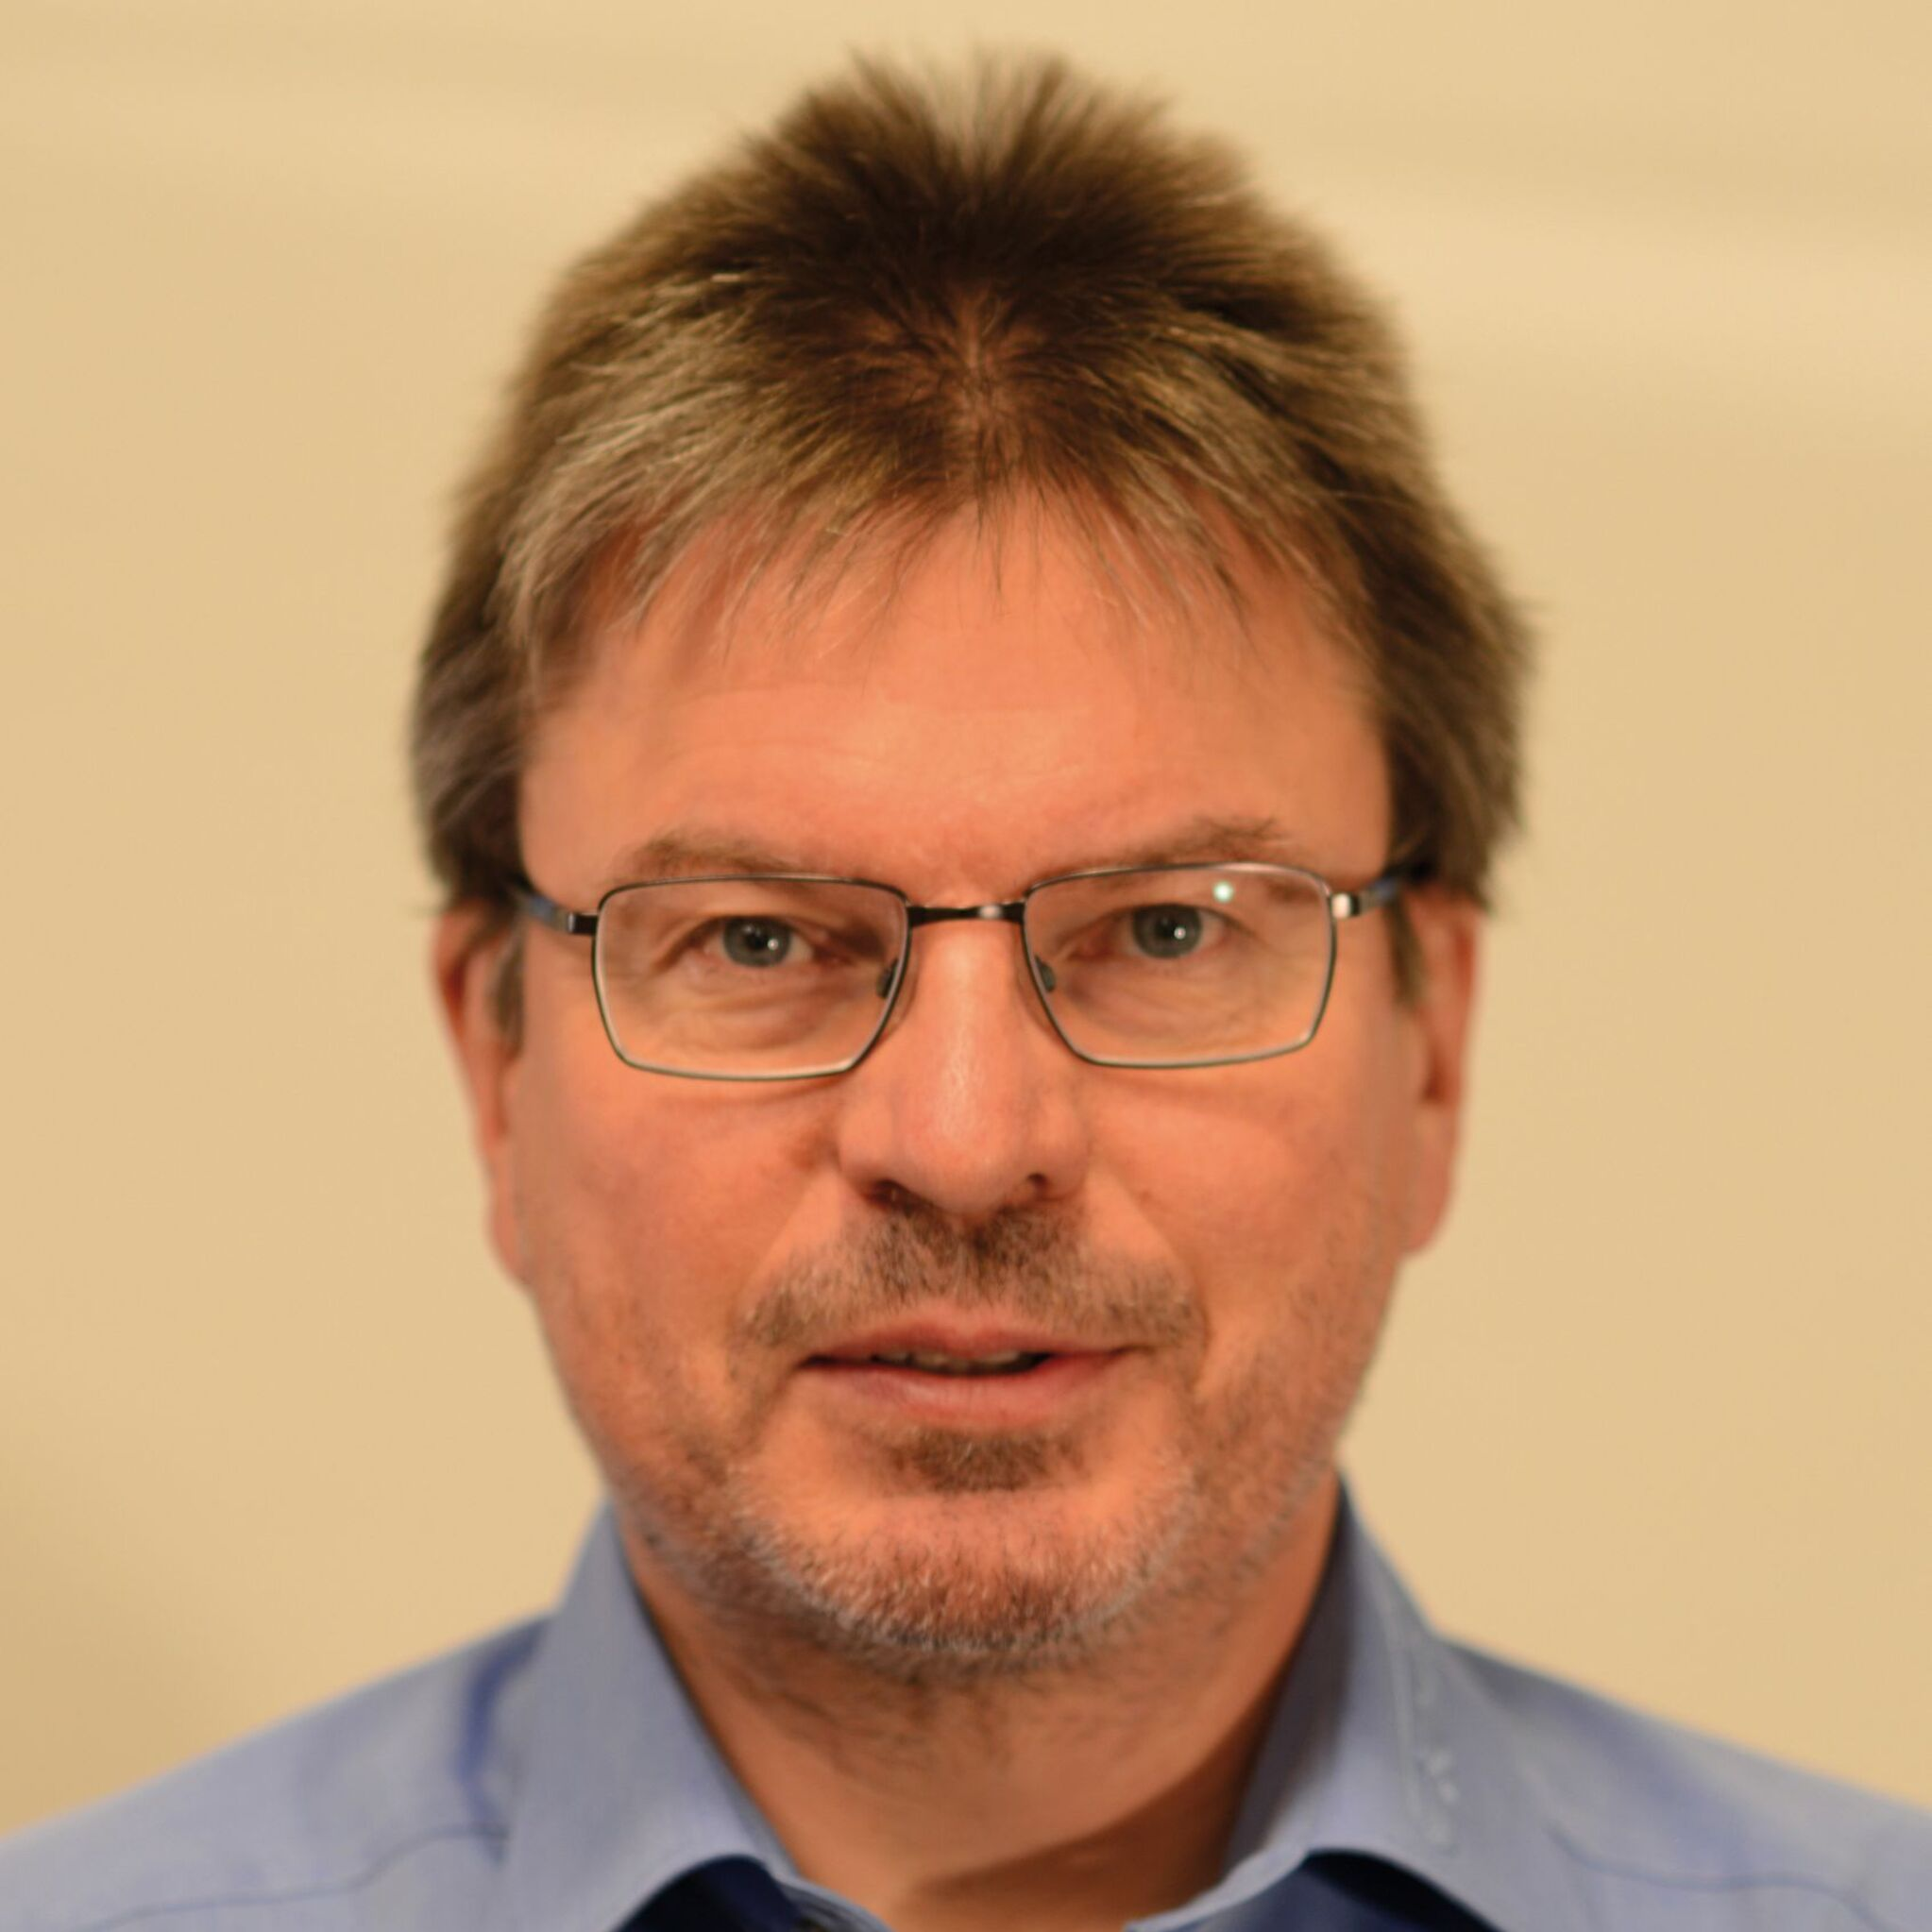 Dr. Harro Hagedorn